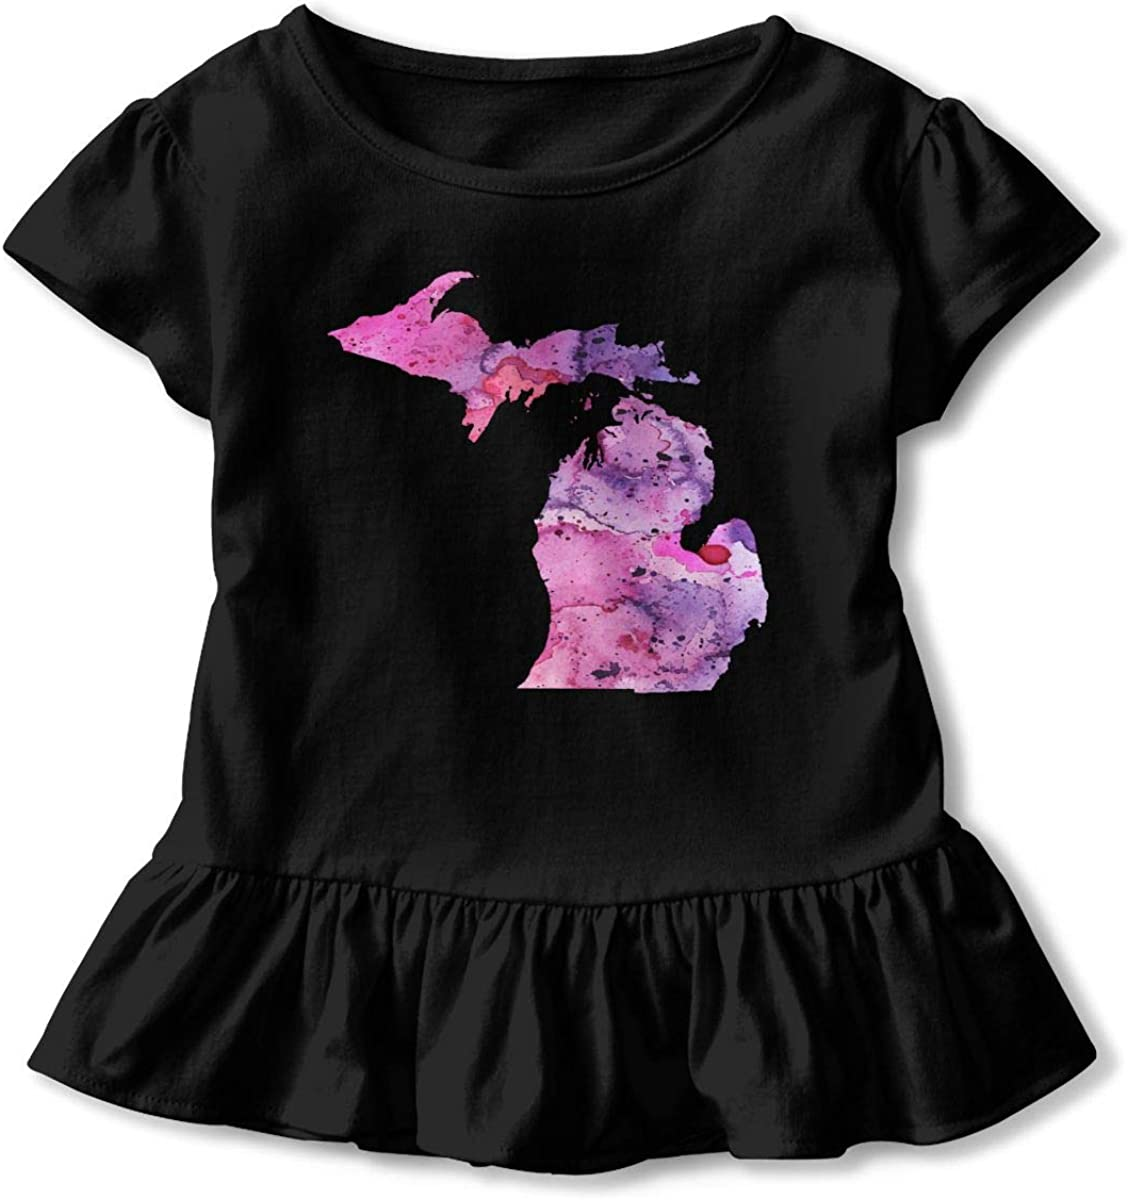 Vintage Albanian Flag-2 Toddler Girls Short Sleeve Cotton T-Shirt